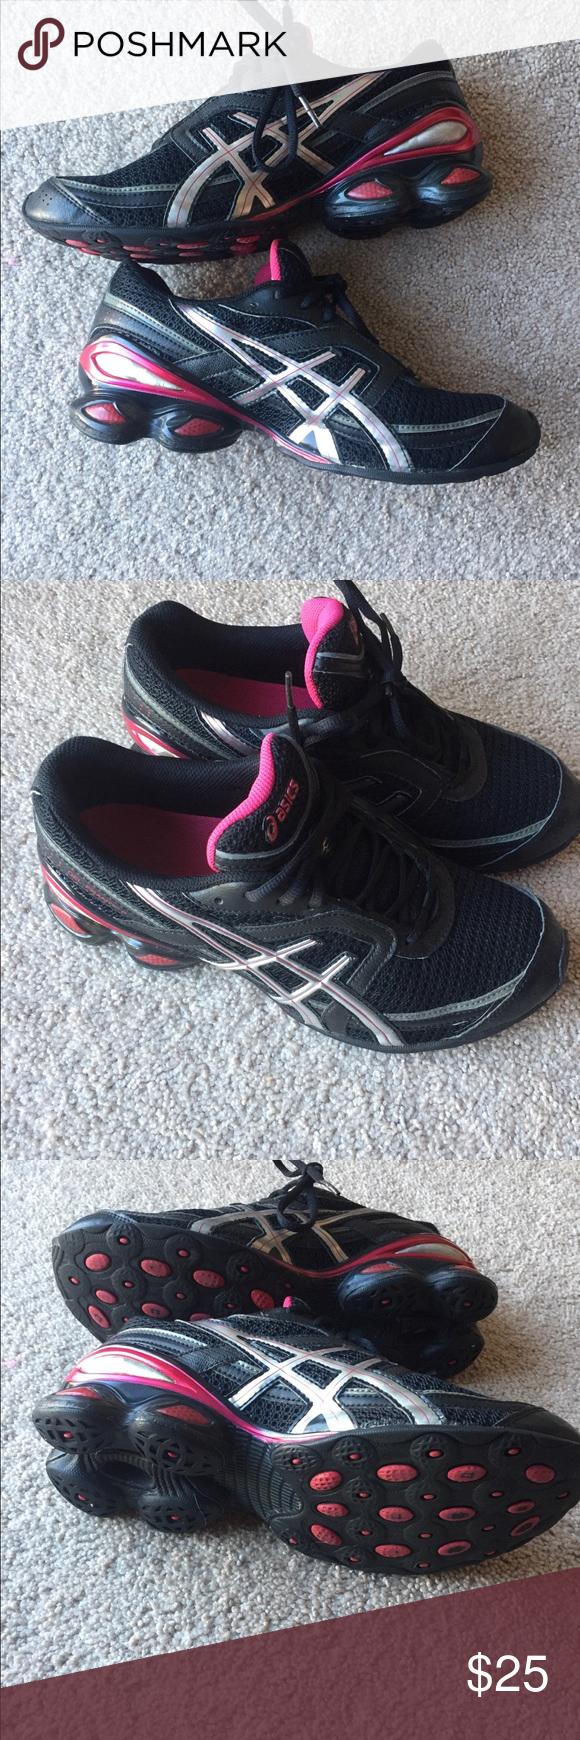 Women's ASICS tennis shoes. Pink/Black